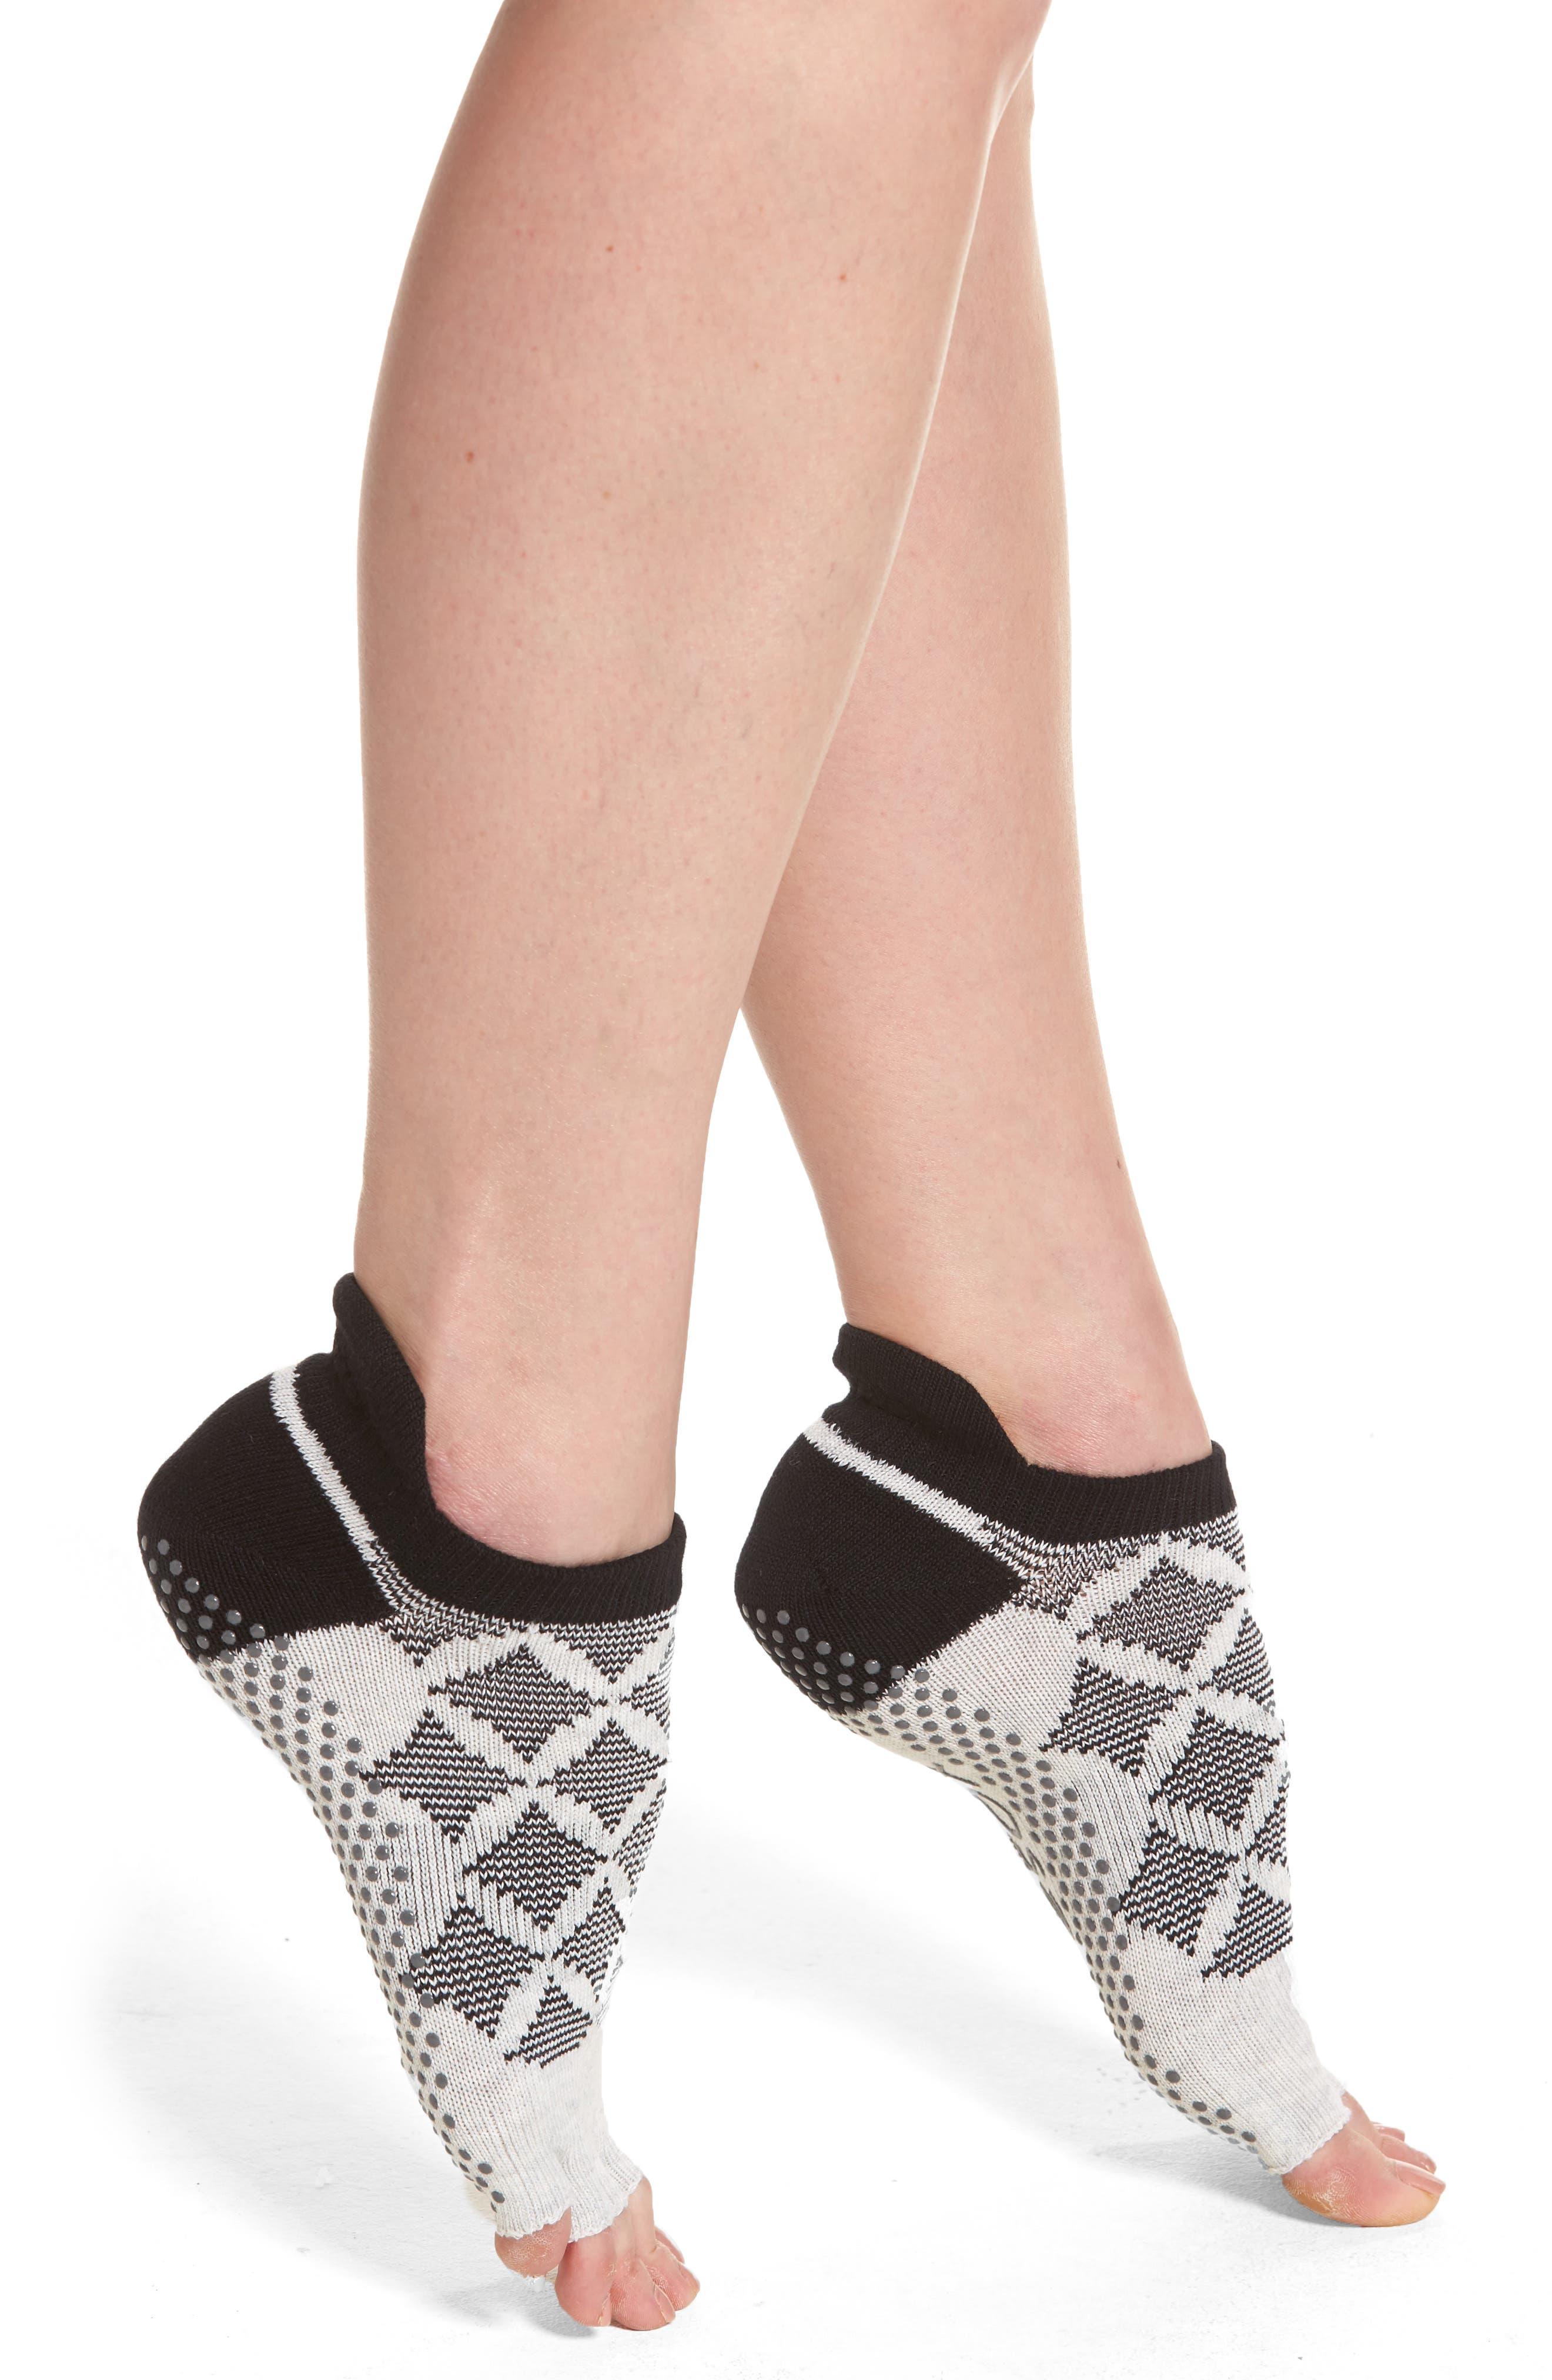 Alternate Image 1 Selected - ToeSox Low Rise Half Toe Gripper Socks